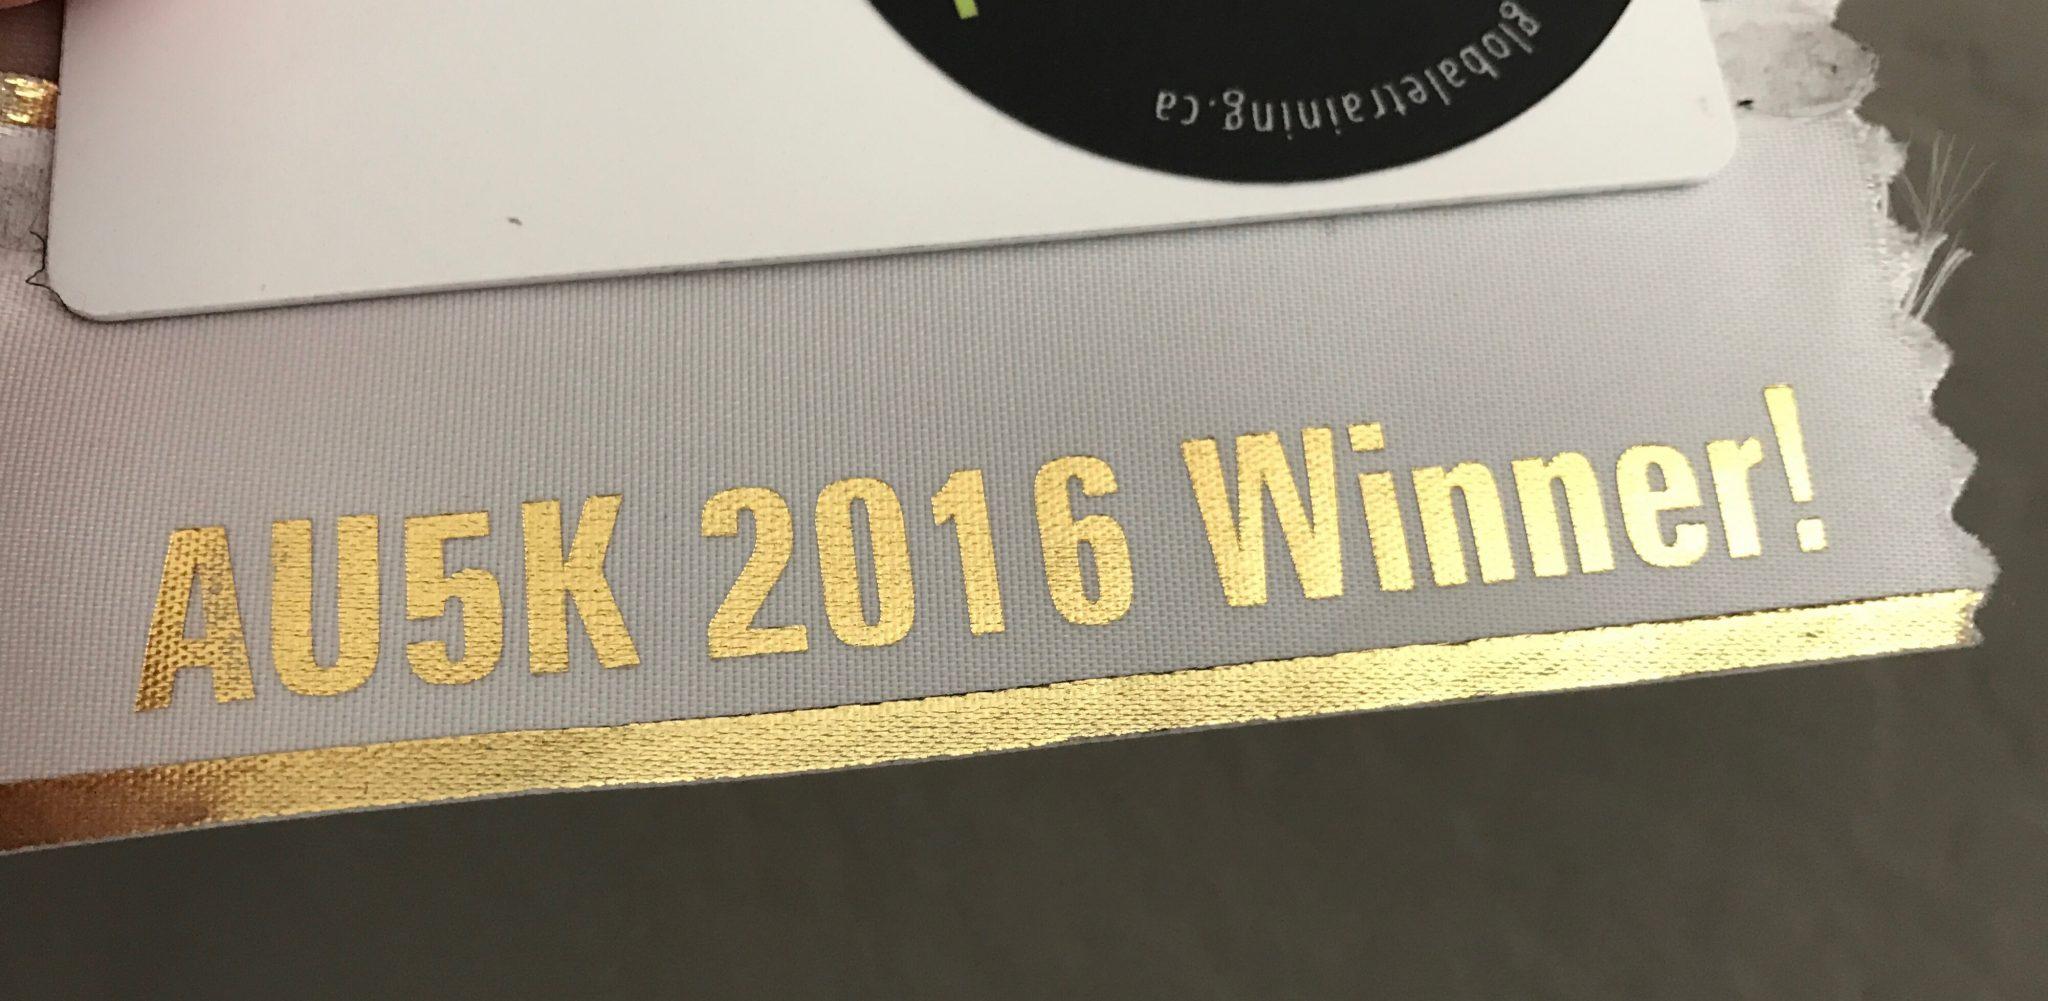 AU5K Winner Ribbon